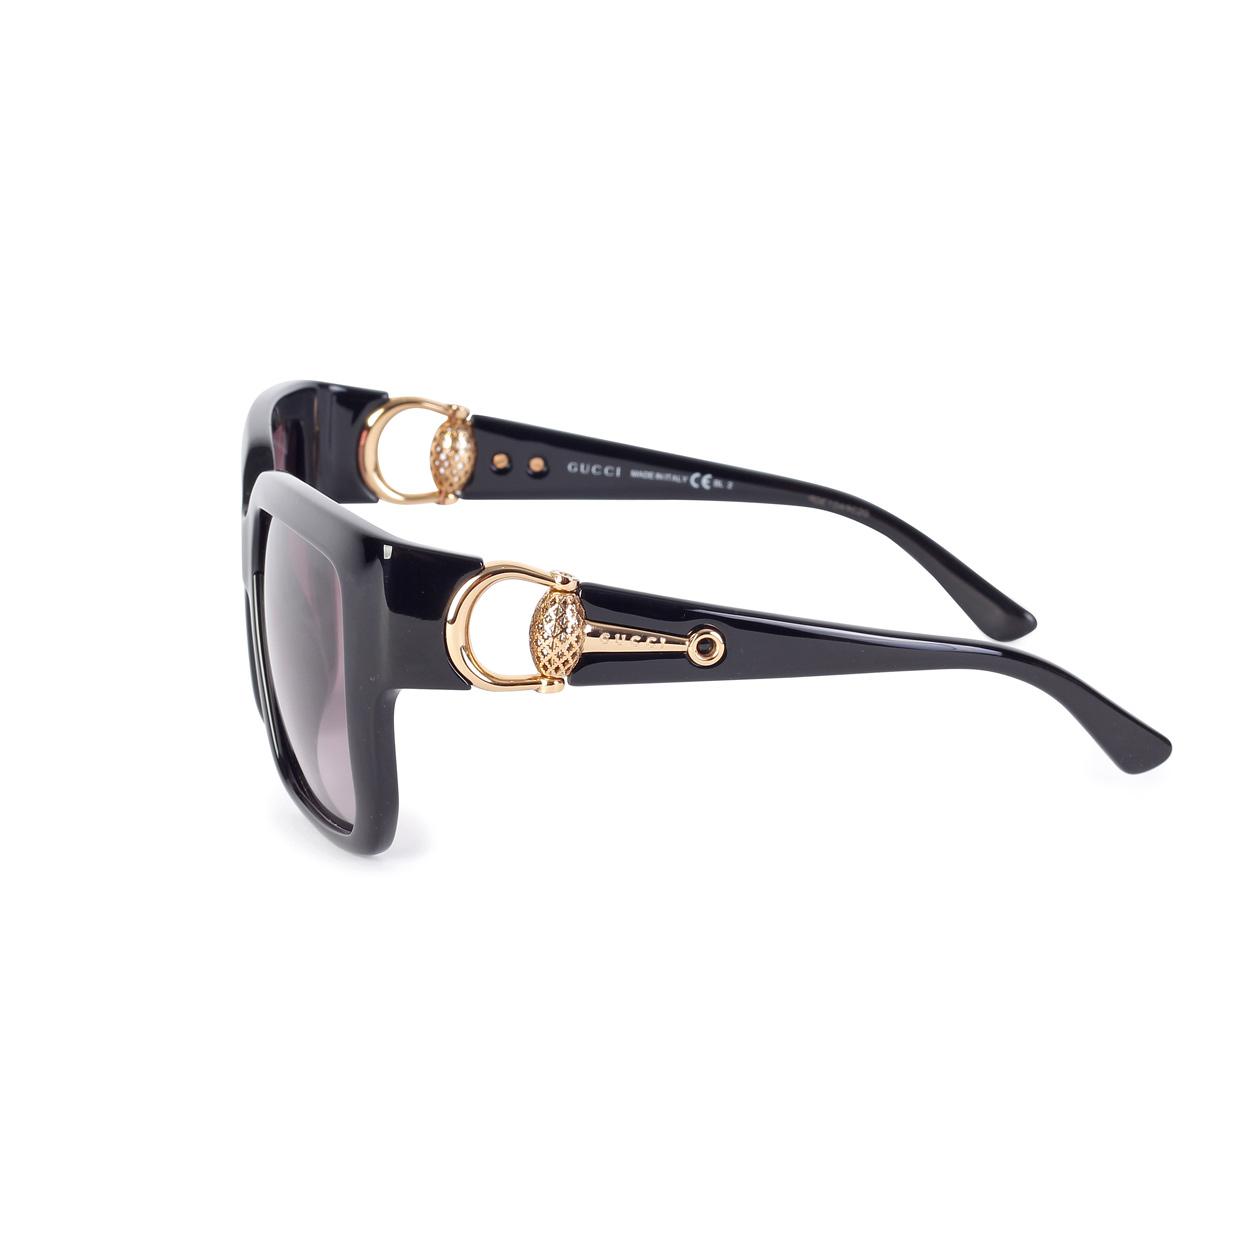 04e3ea97c20ca Oversized Round-frame Metal Glasses Gucci